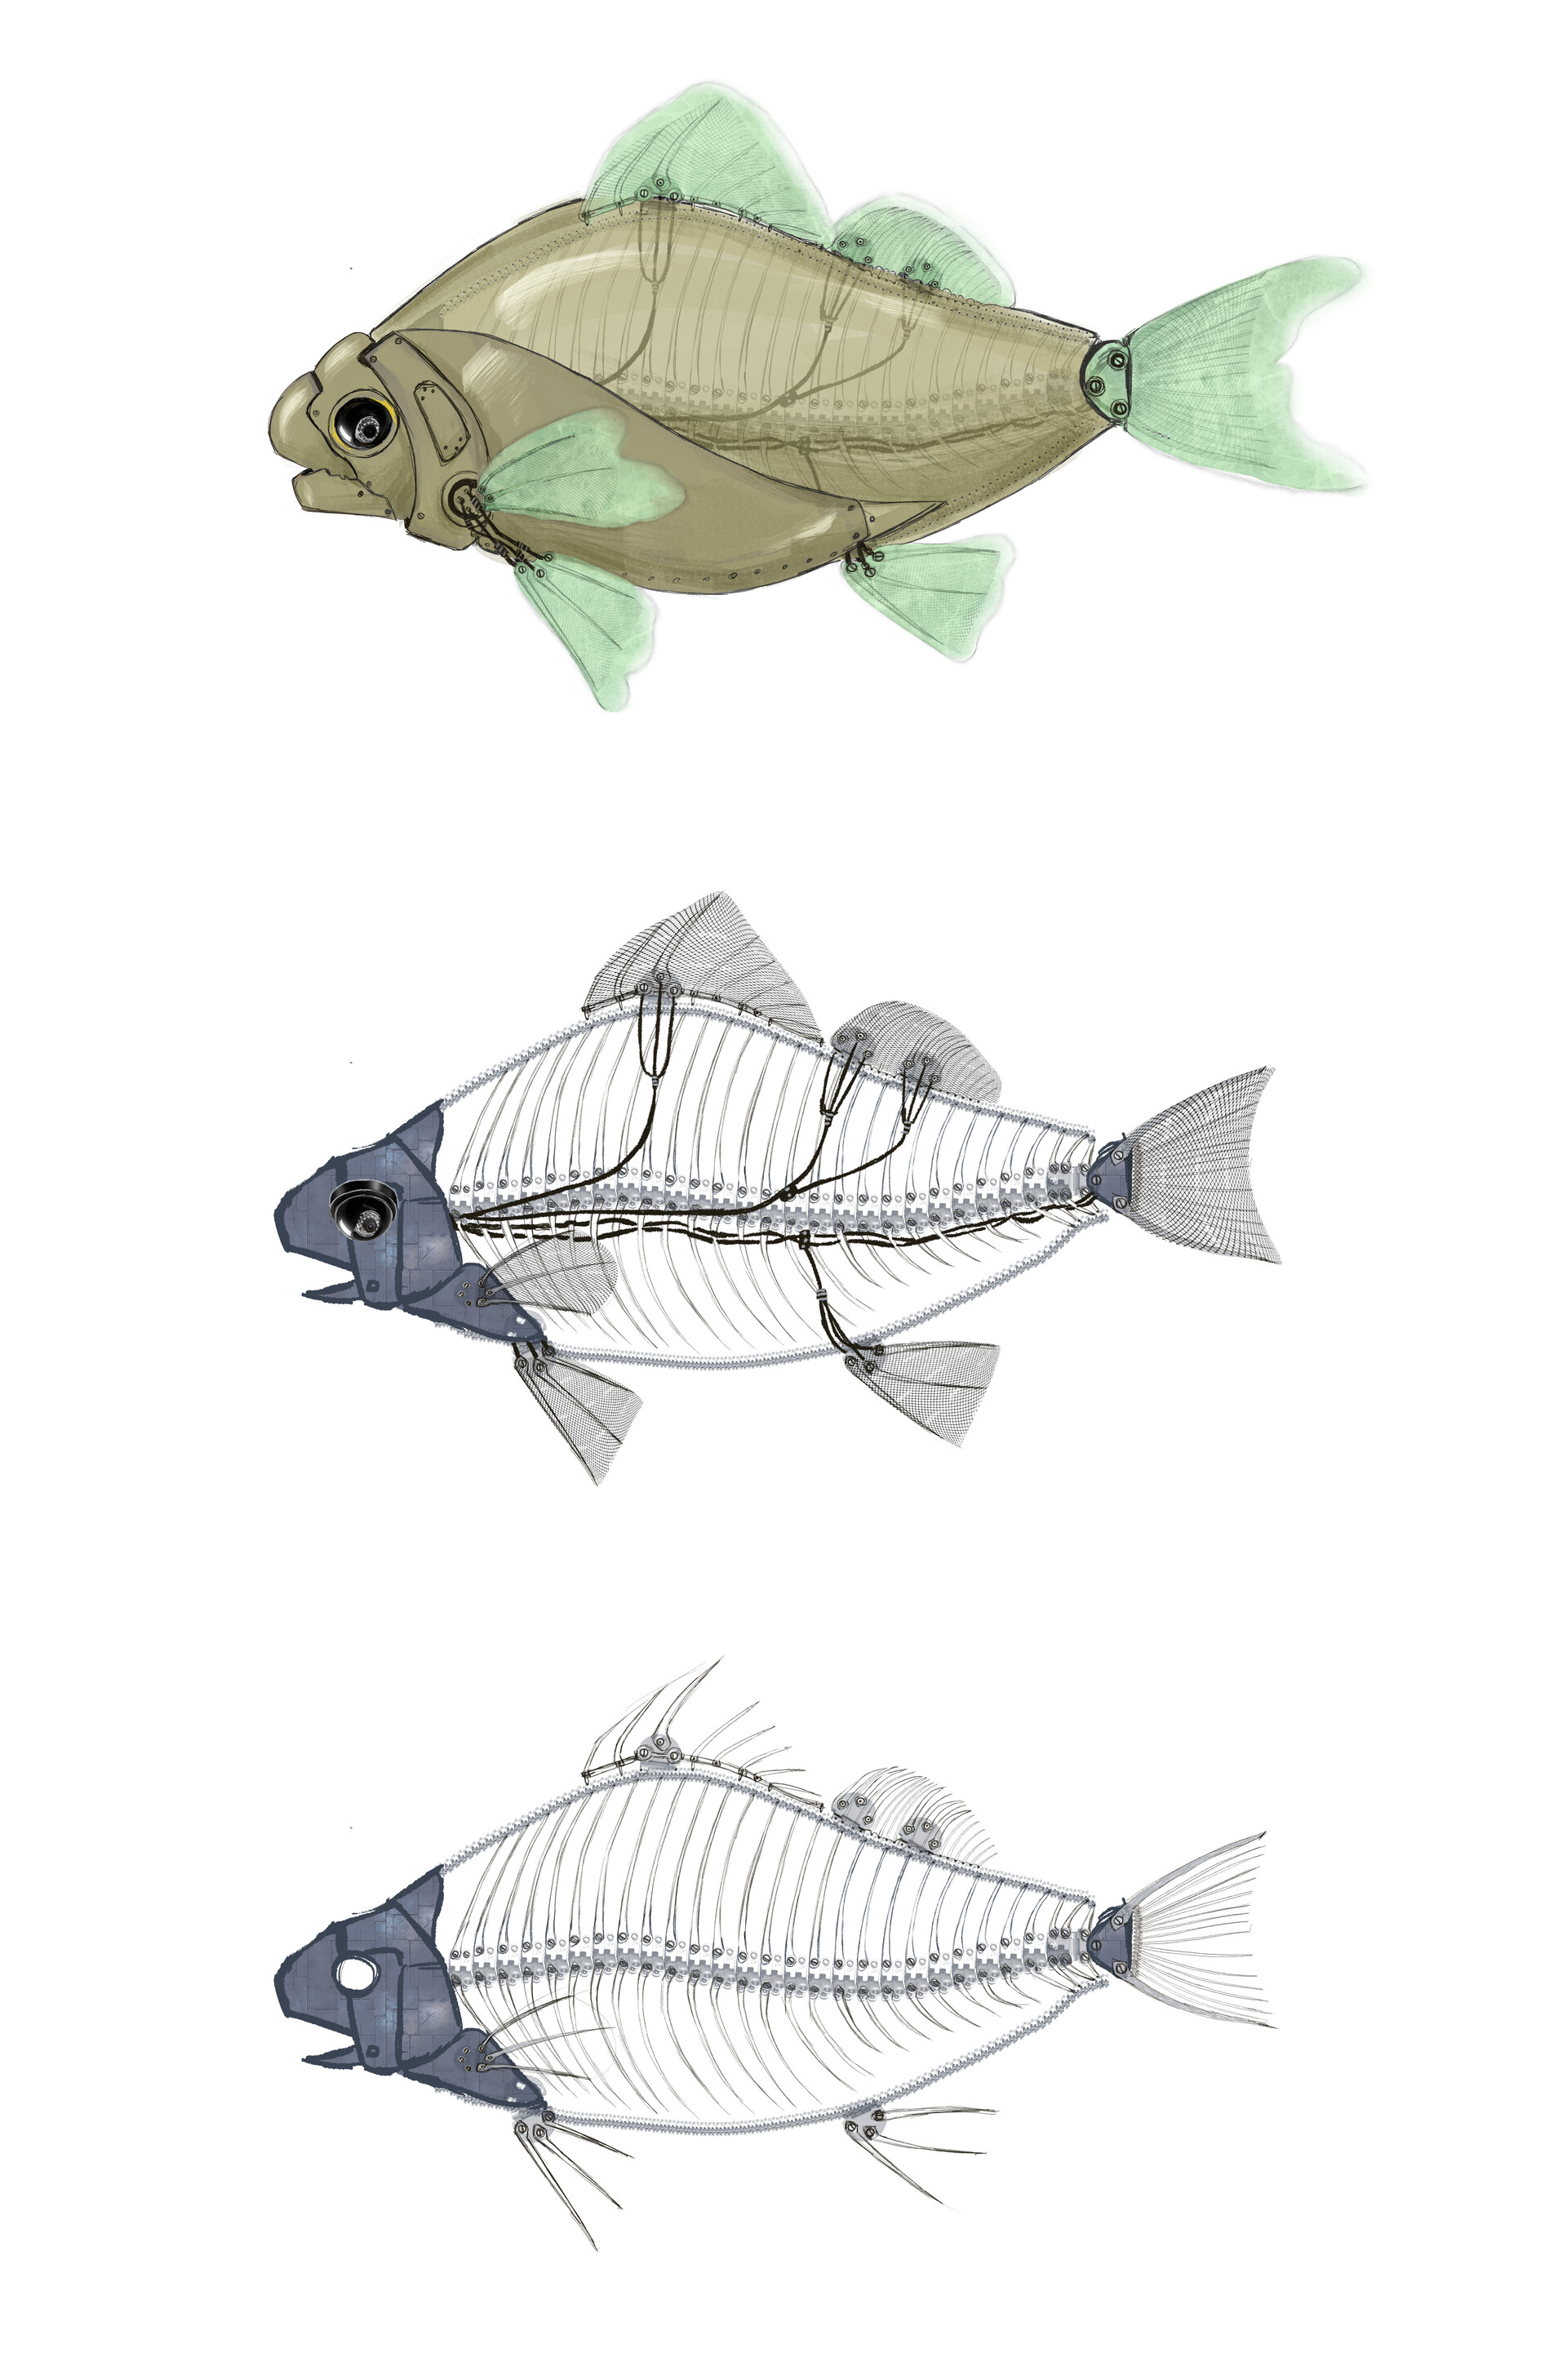 Elisa moriconi pesce rosso meccanico fasi